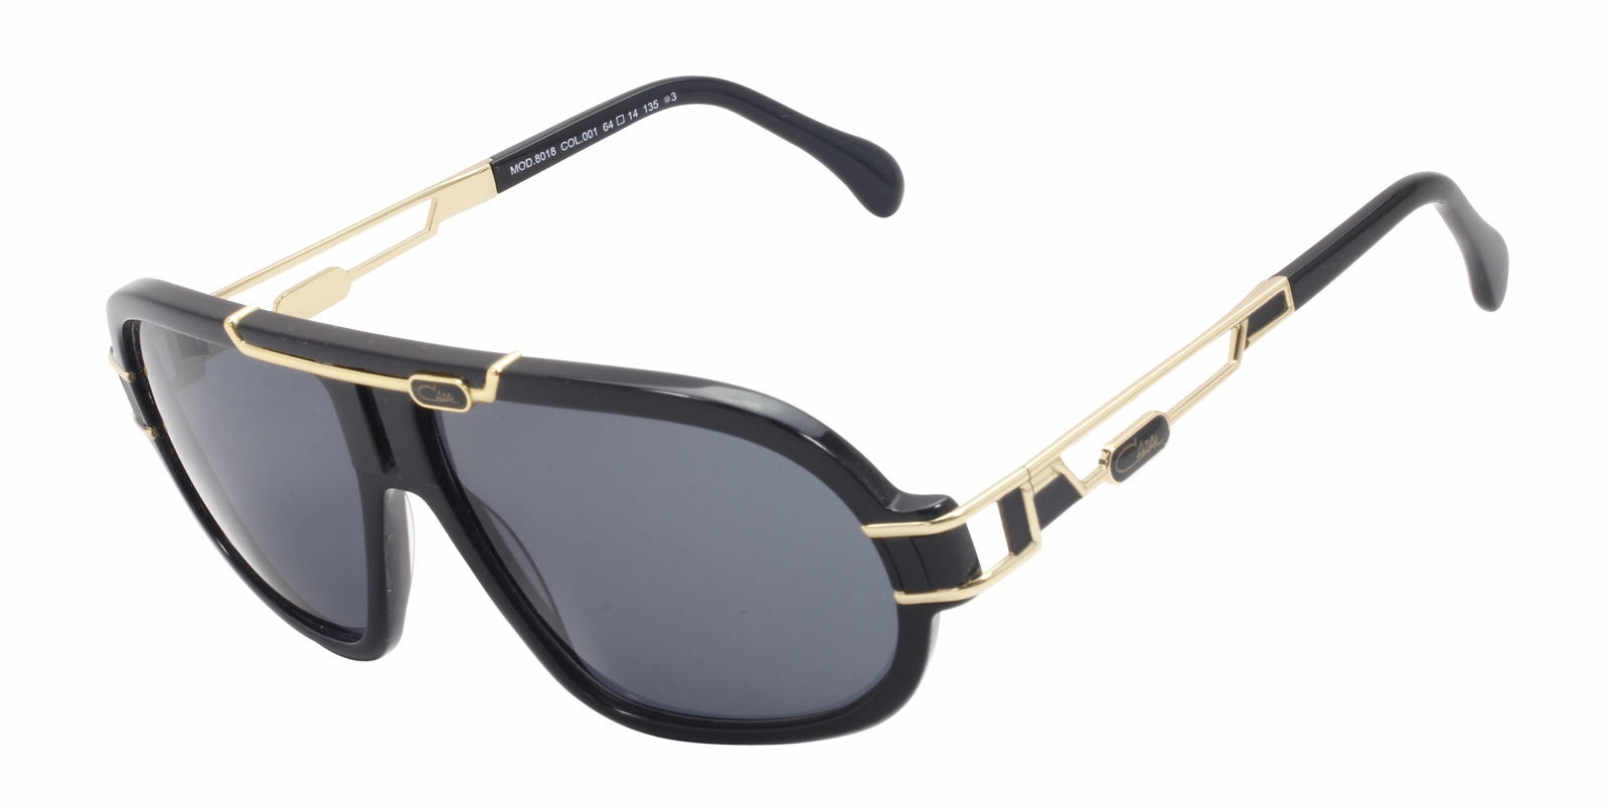 2efb0c2886f Cazal 8018 Sunglasses